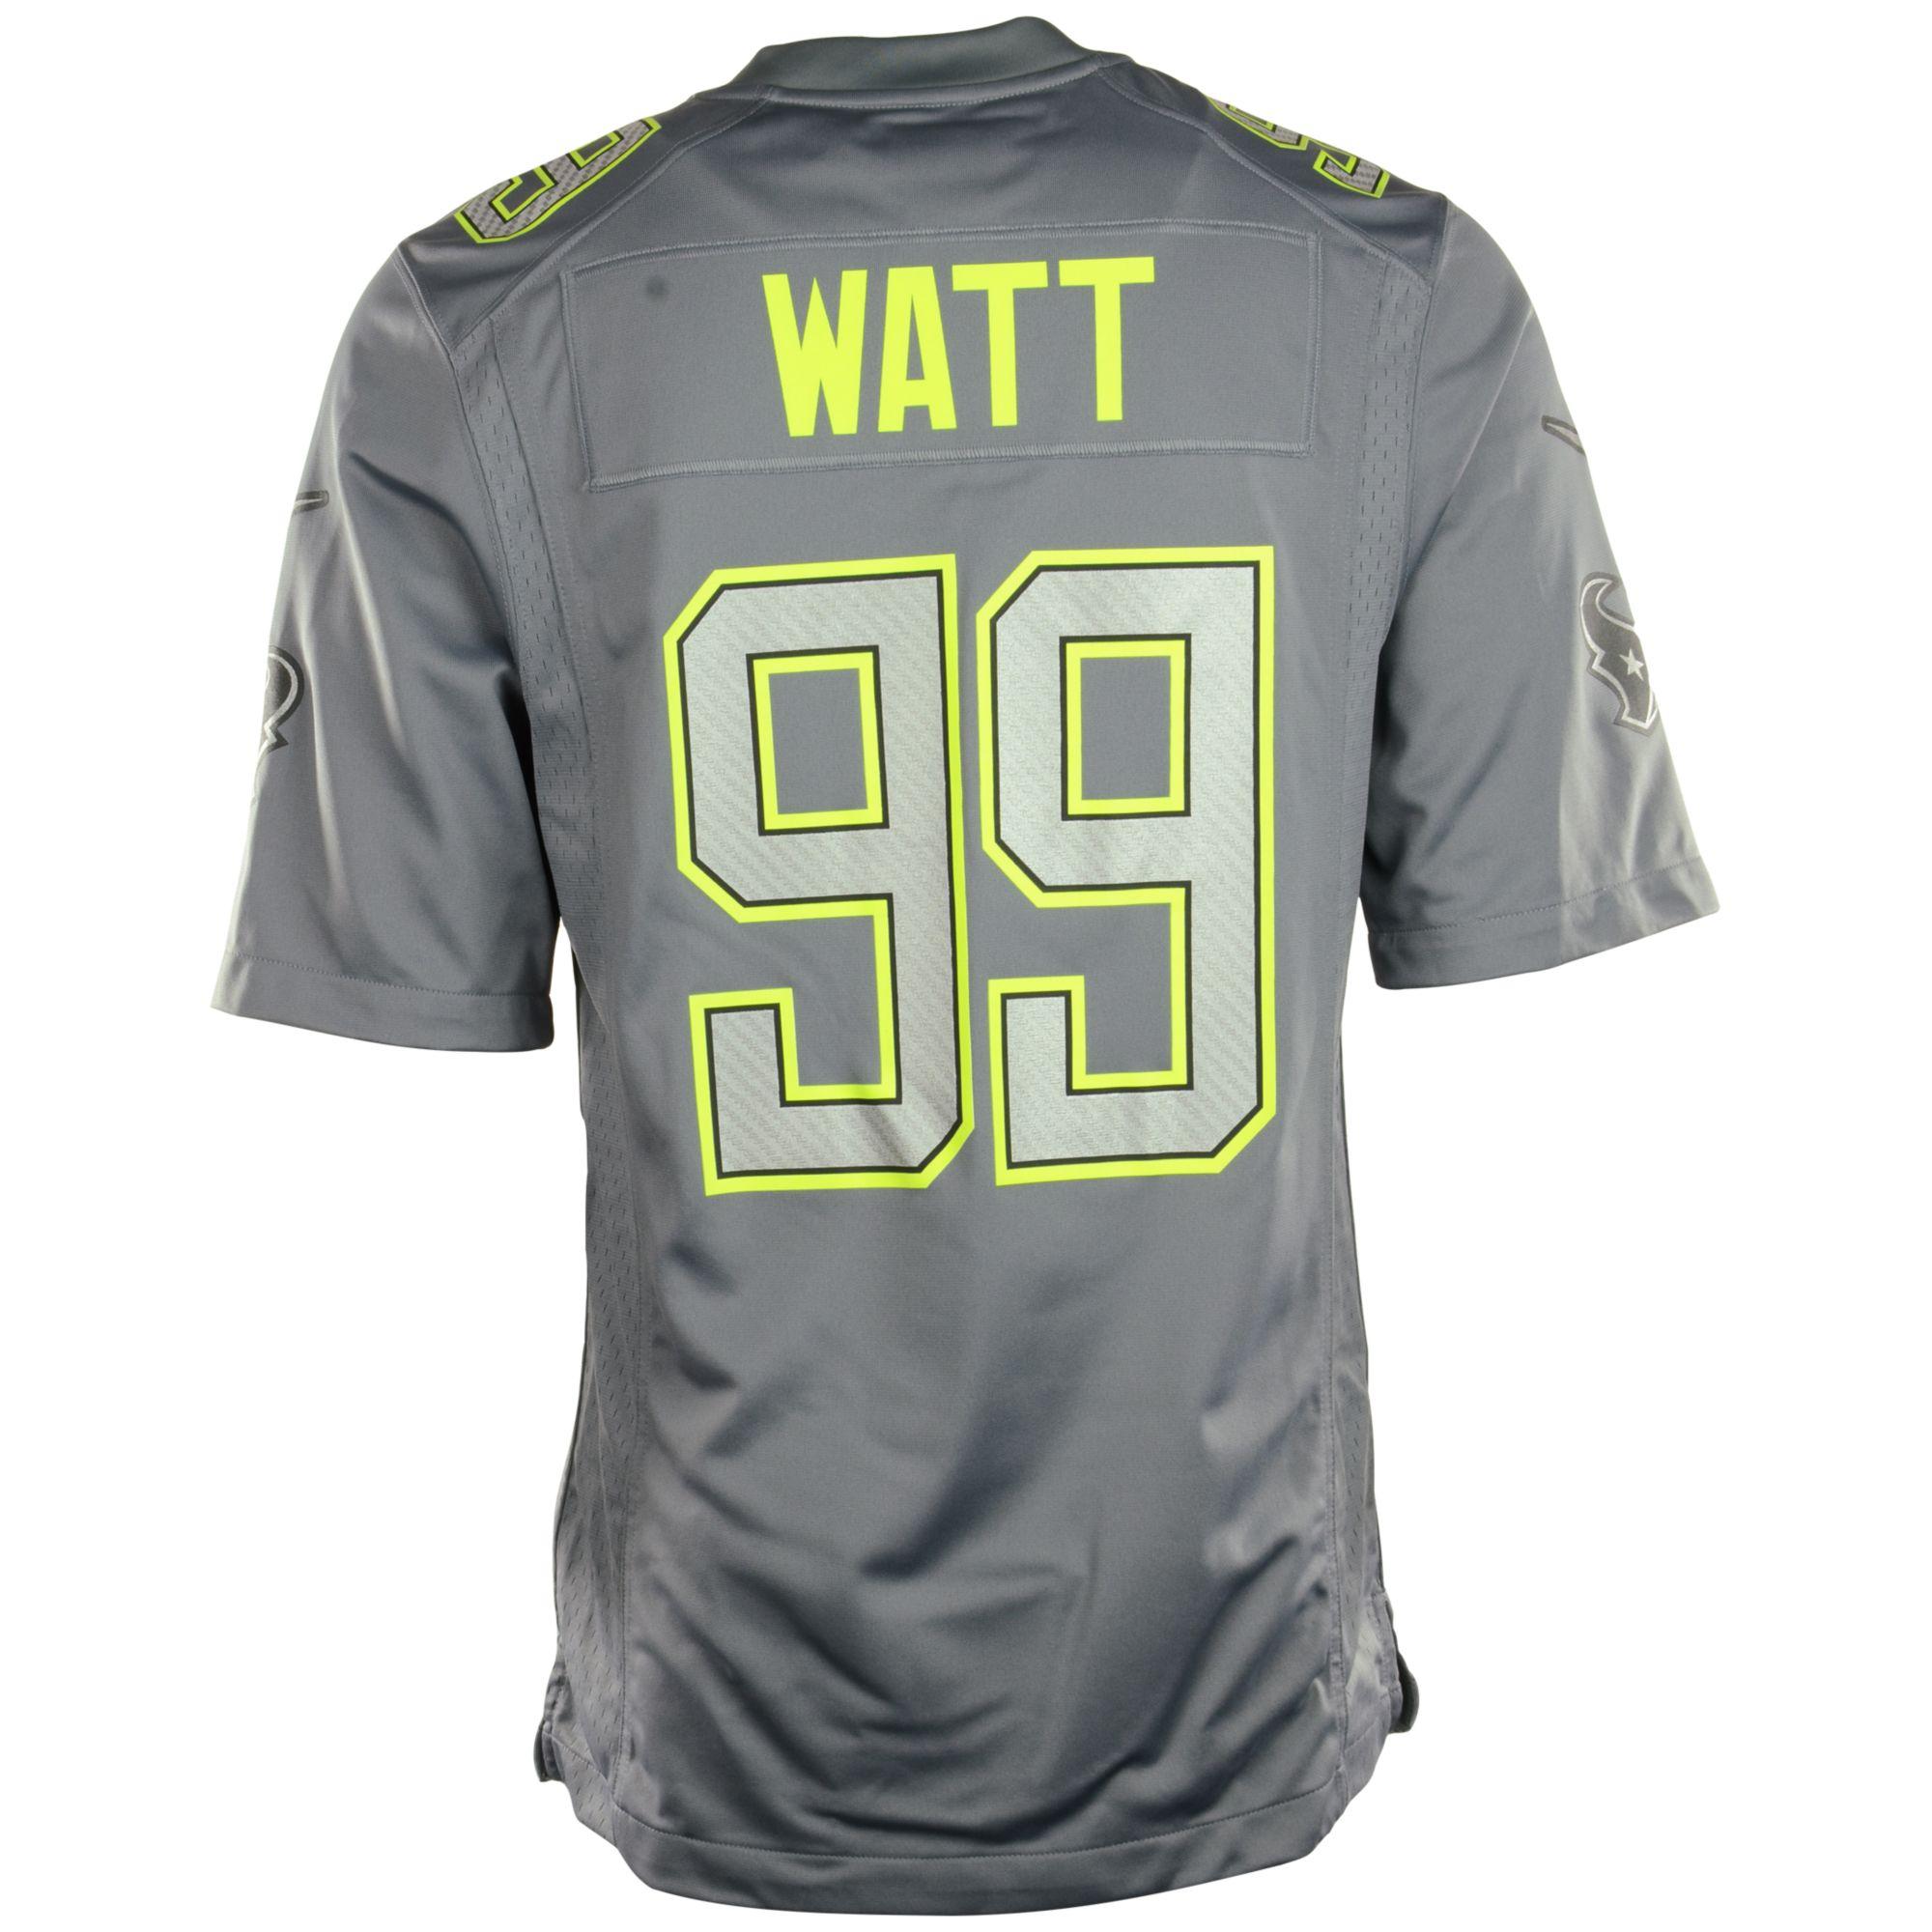 Jj Watt Houston Texans Pro Bowl Jersey